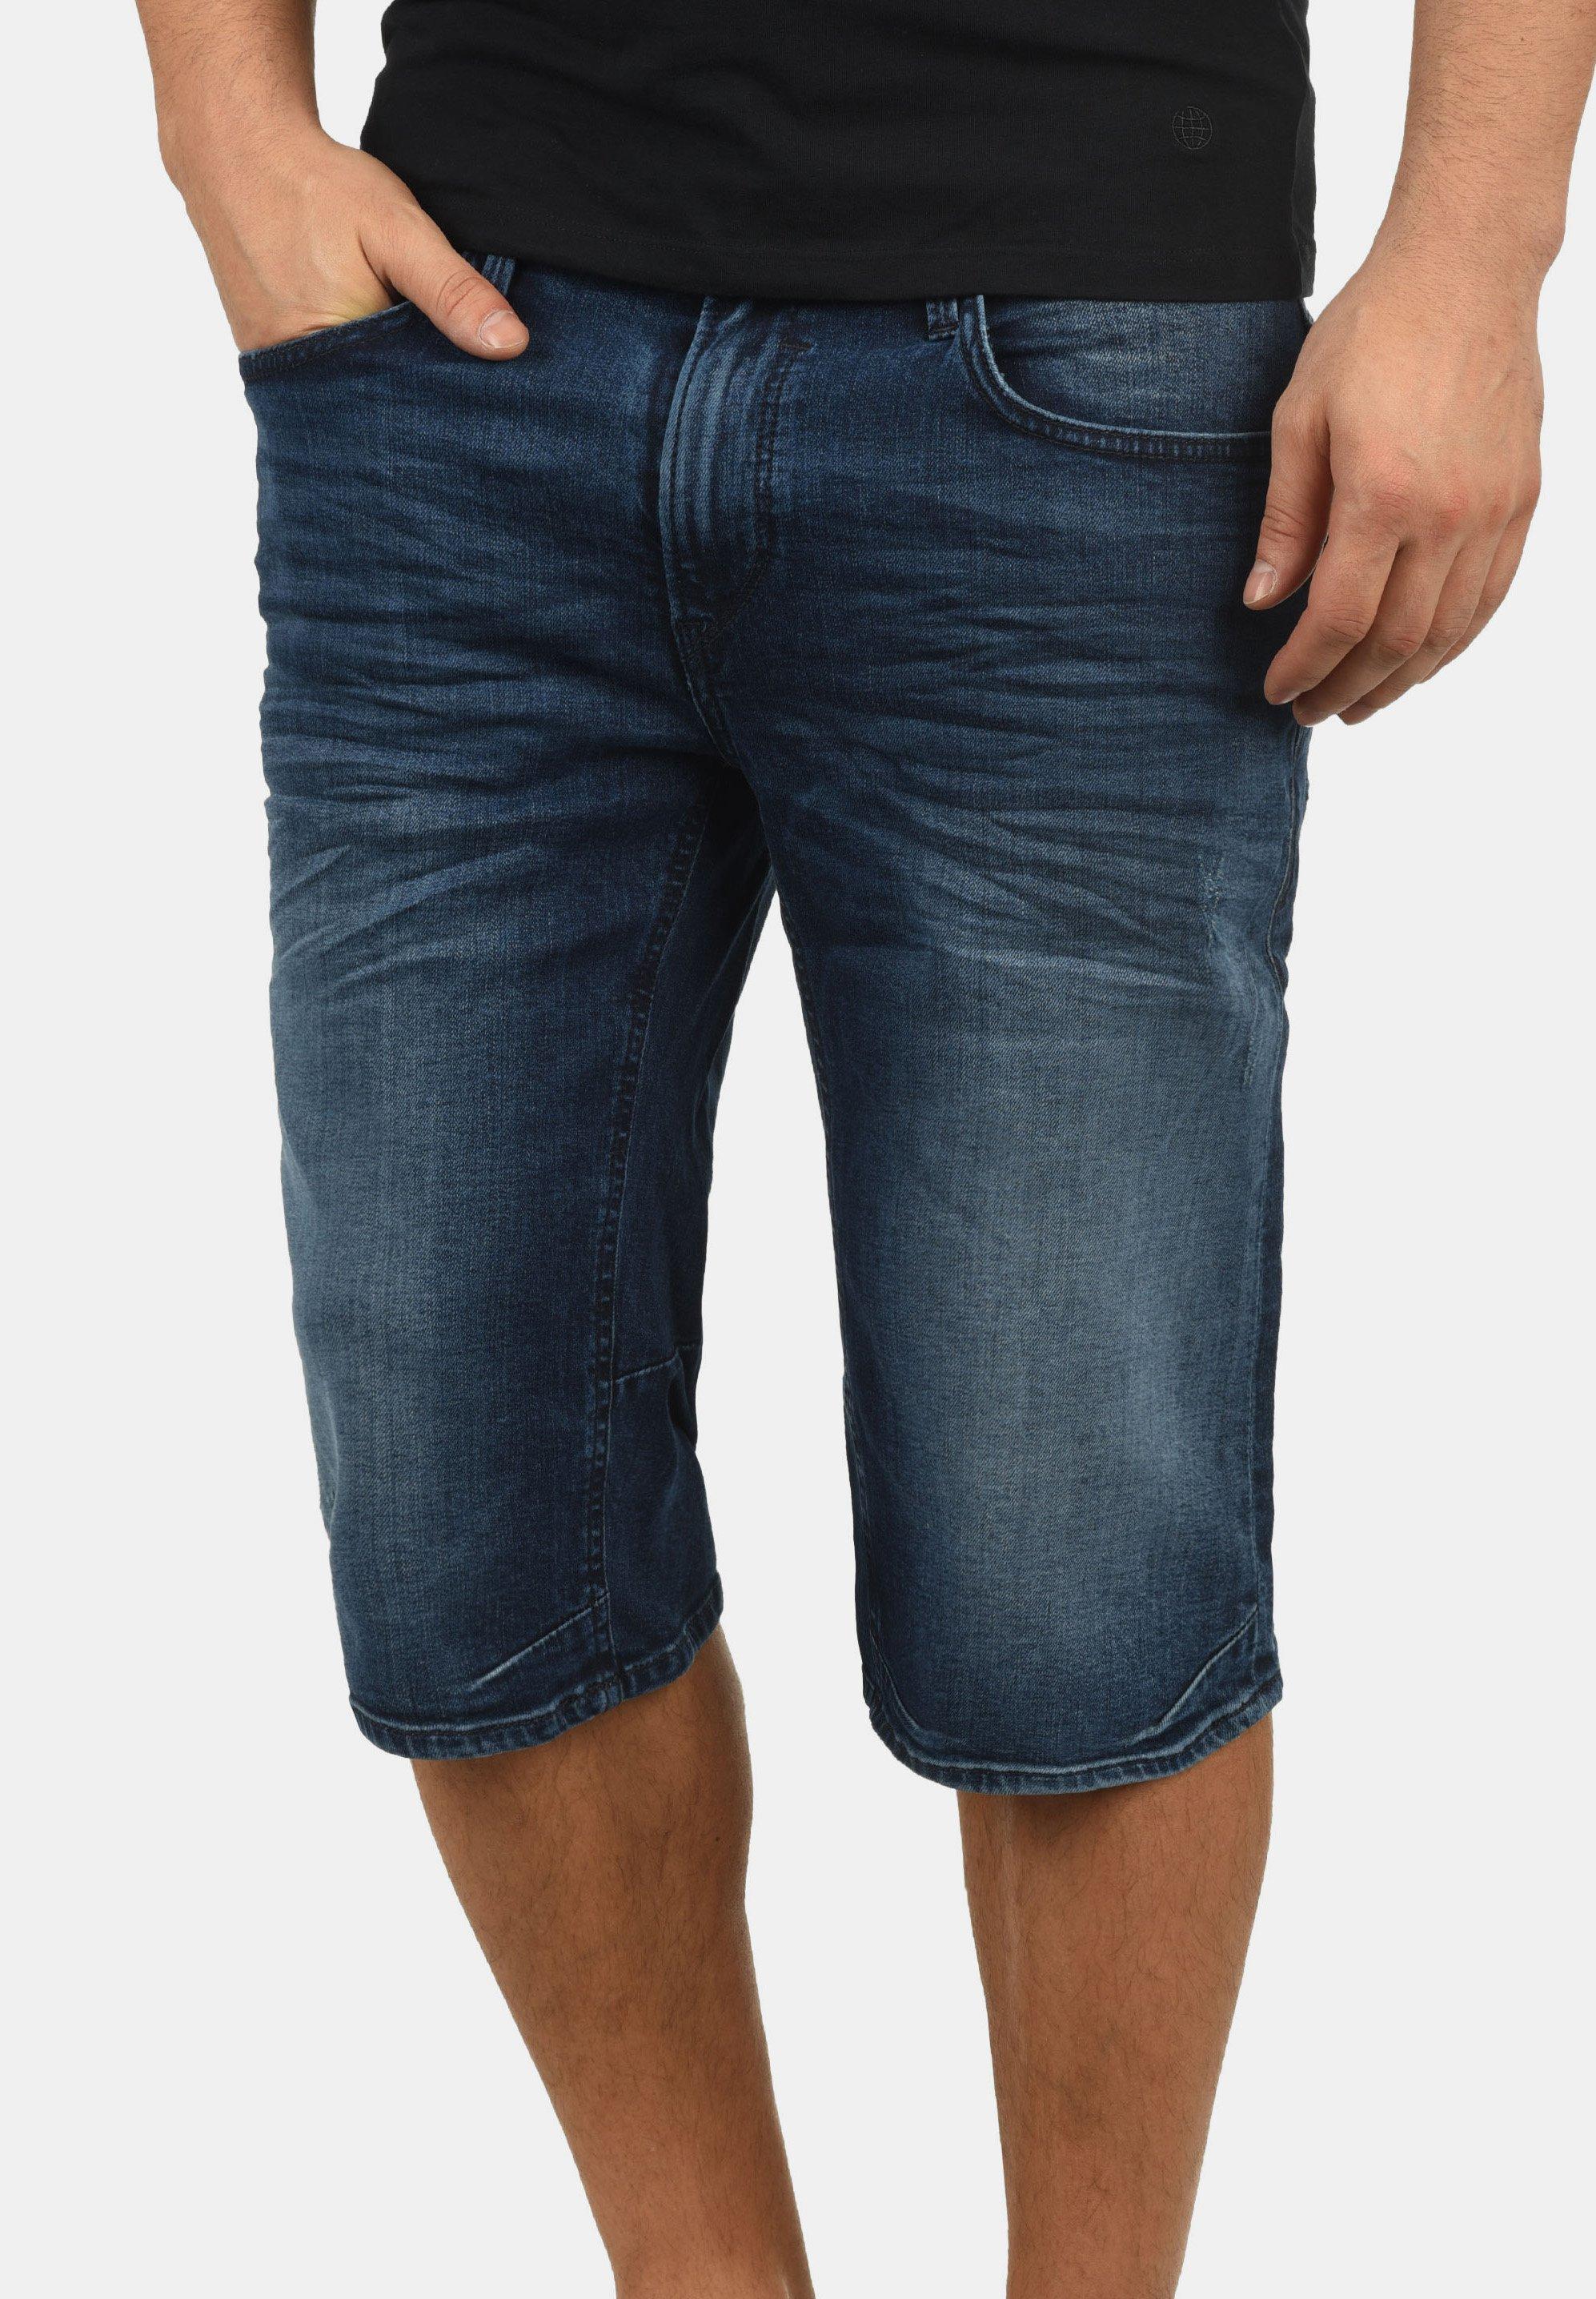 Herrer DENON - Jeans Short / cowboy shorts